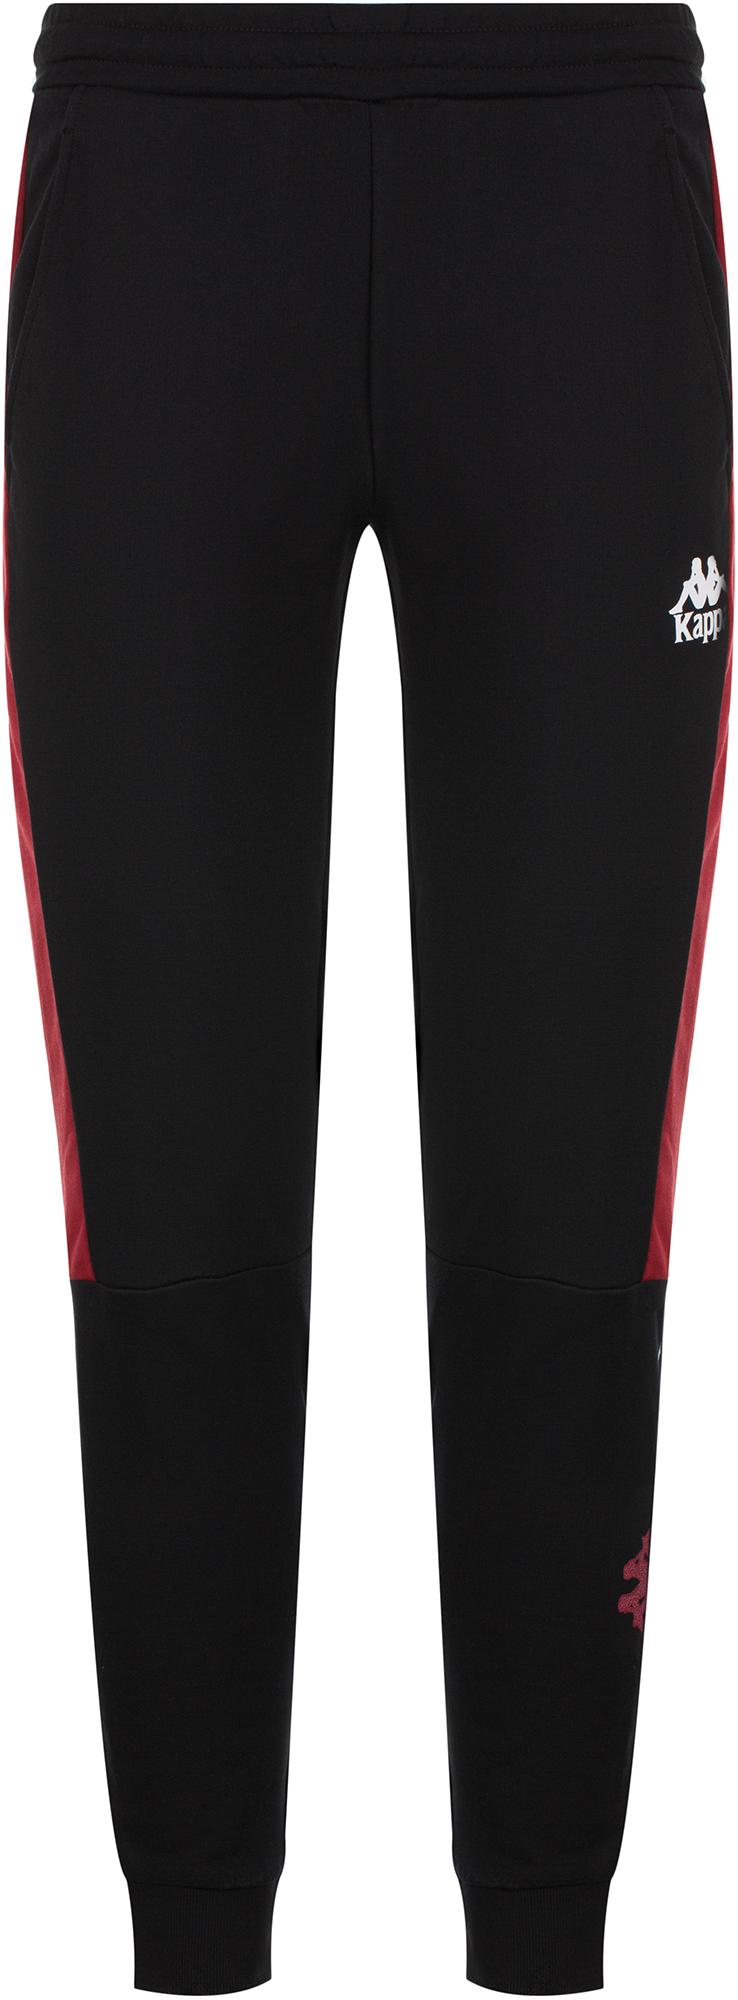 Фото - Kappa Брюки мужские Kappa, размер 46 брюки мужские kappa men s trousers цвет графитовый 304jr00 3a размер xl 52